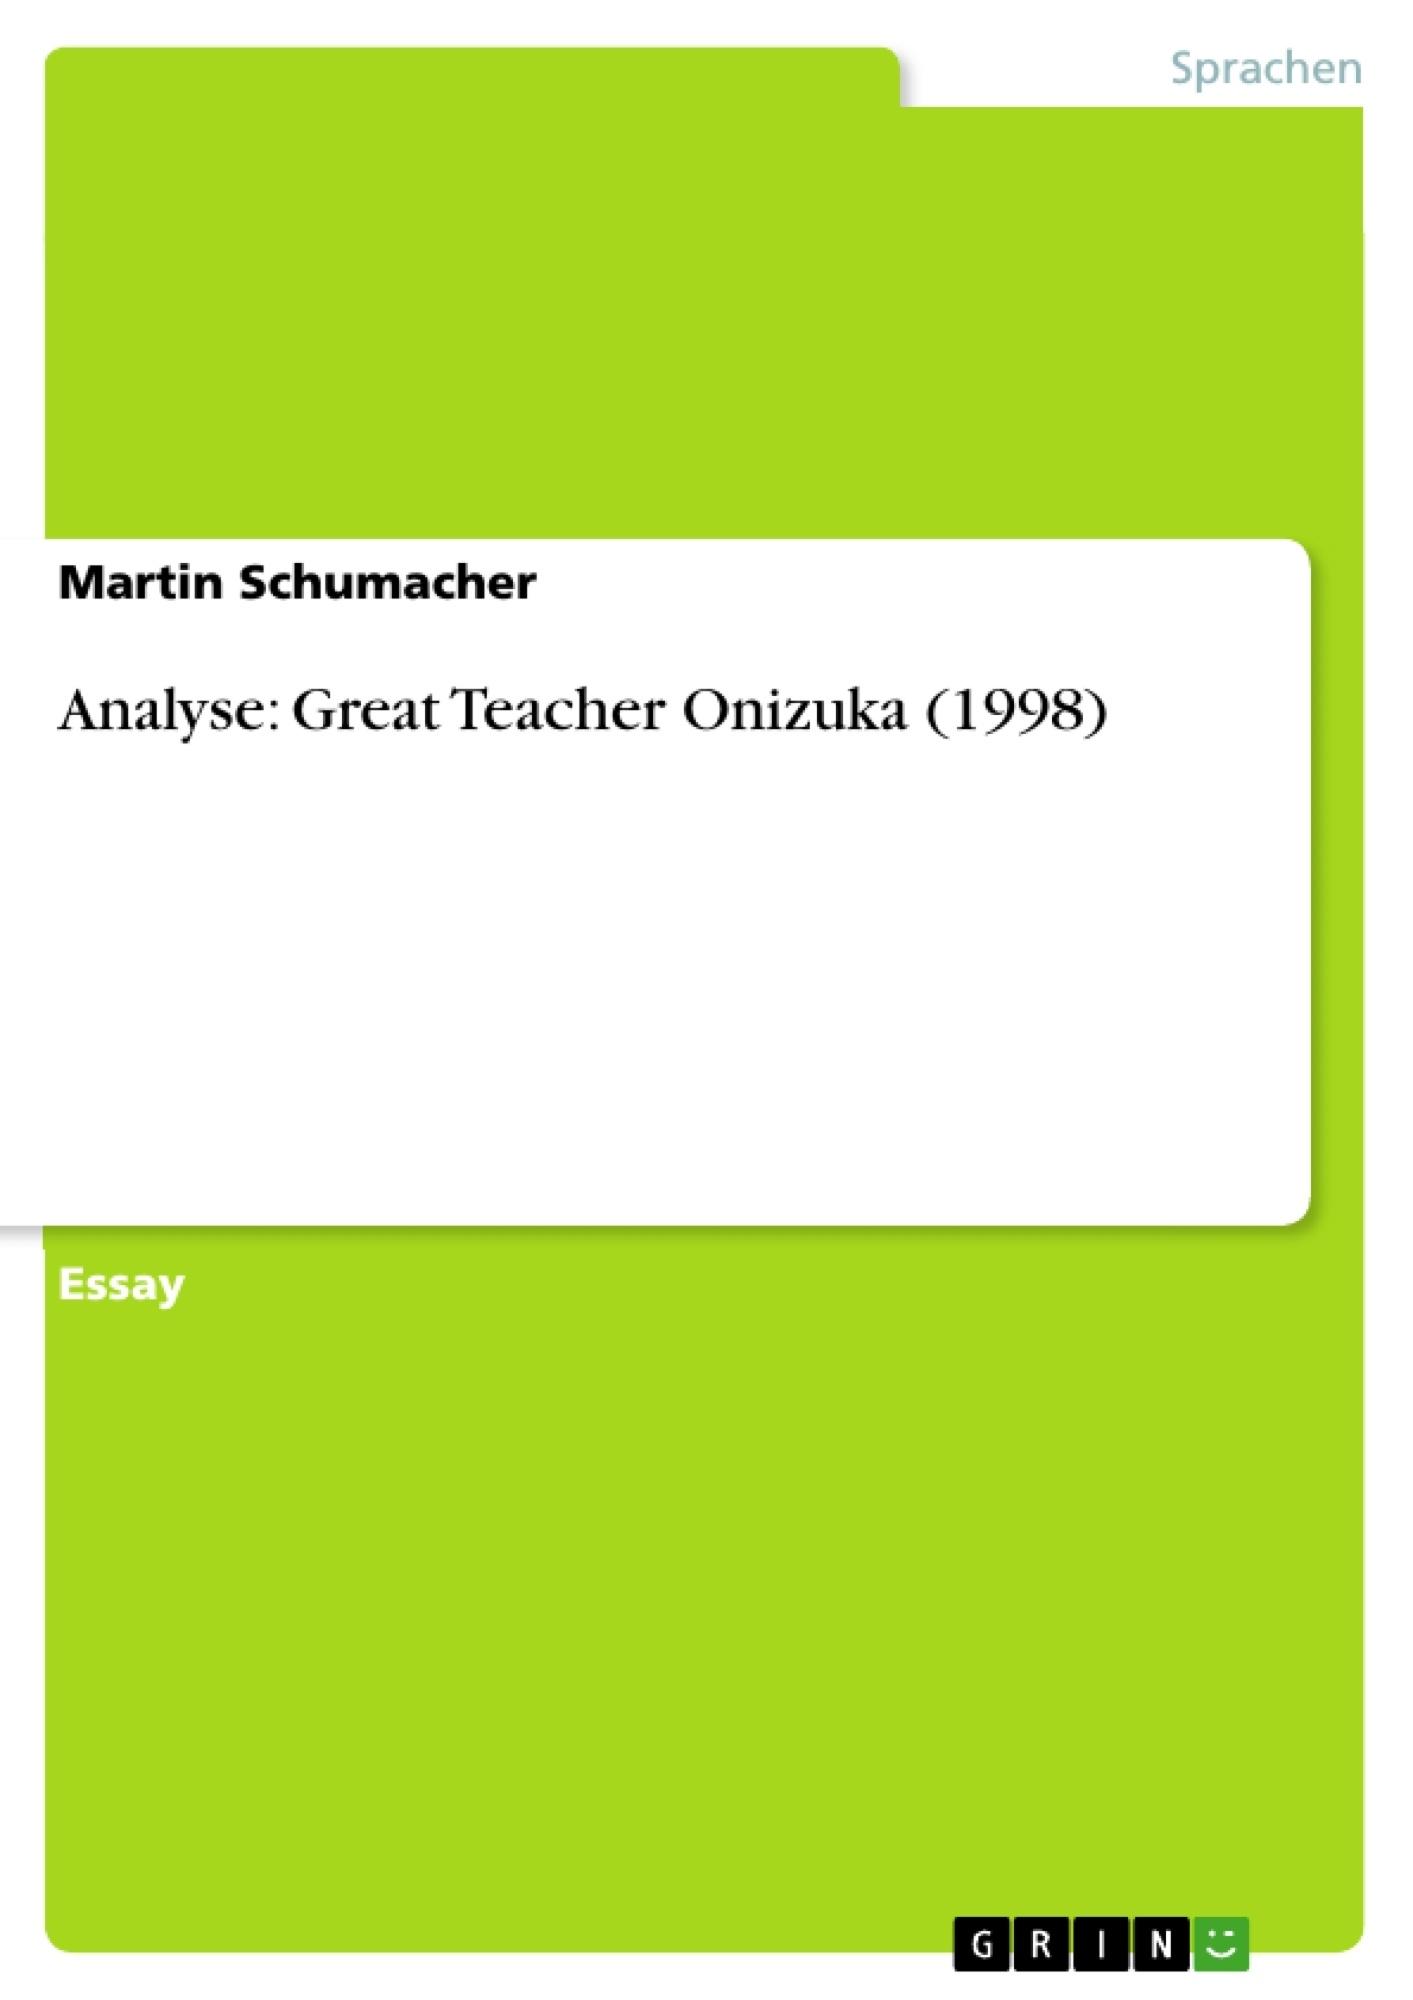 Titel: Analyse: Great Teacher Onizuka (1998)